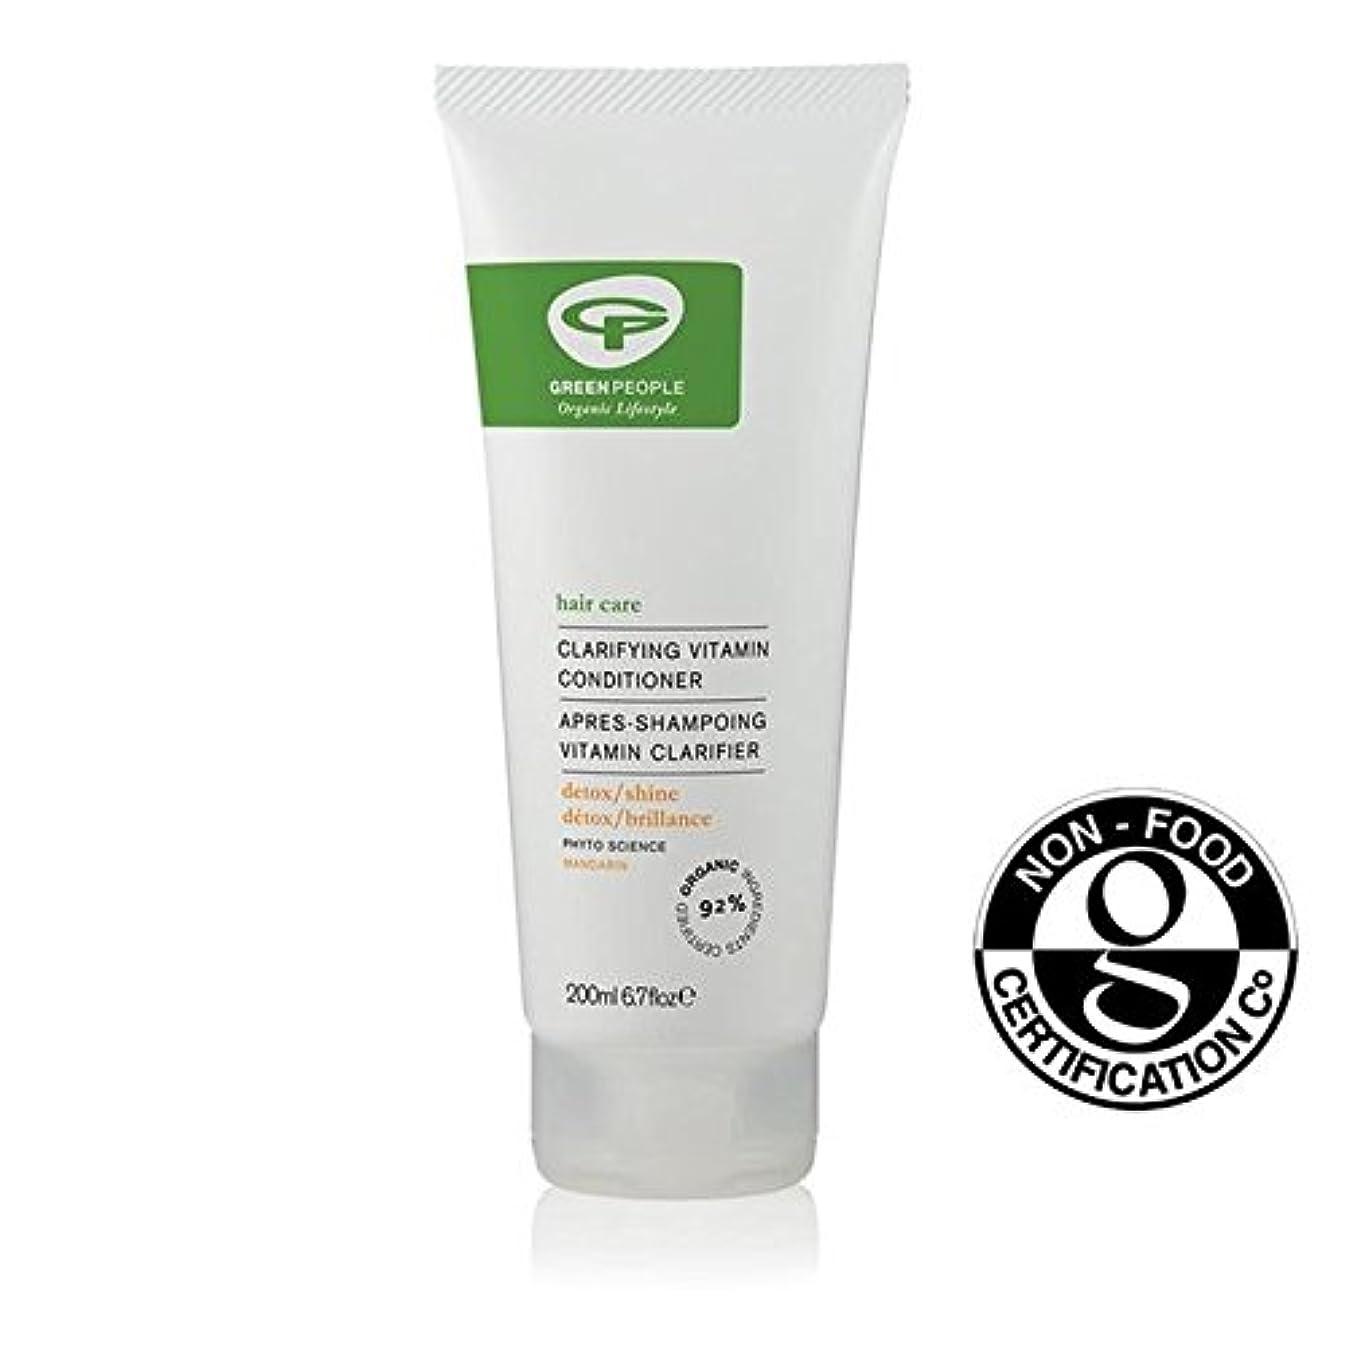 Green People Organic Clarifying Vitamin Conditioner 200ml - 緑の人々の有機明確ビタミンコンディショナー200 [並行輸入品]